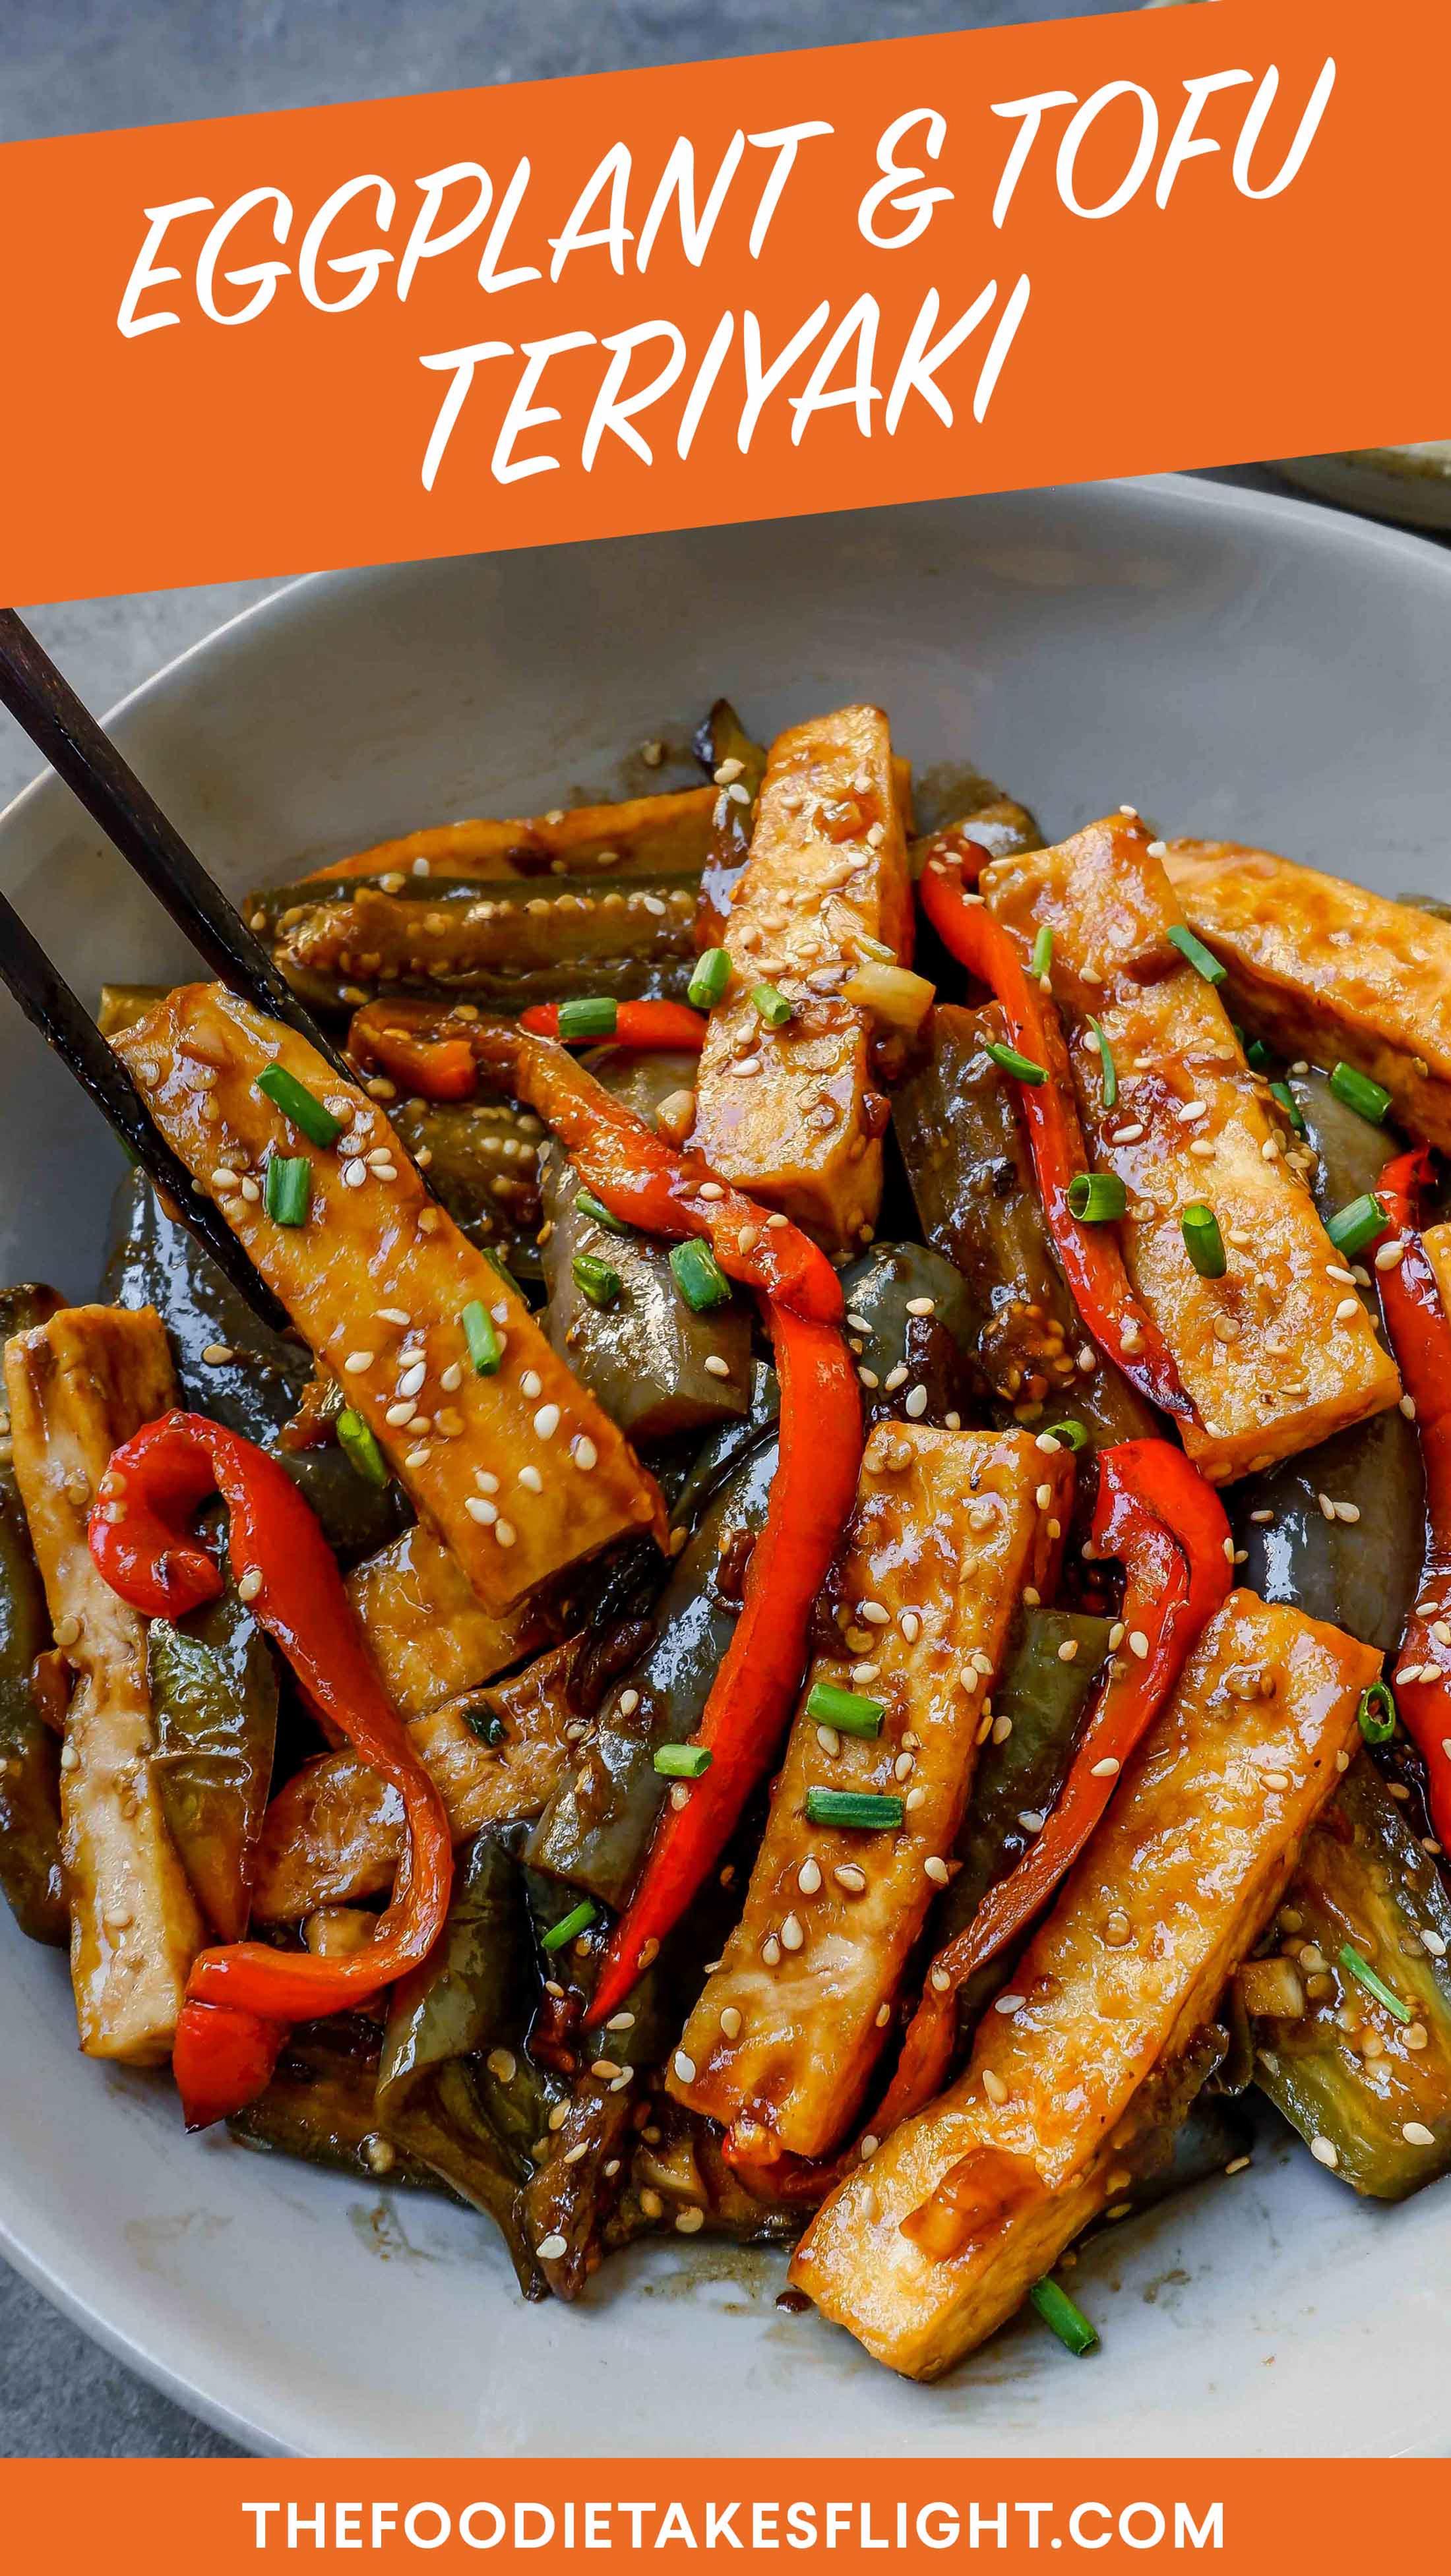 Eggplant And Tofu Teriyaki Vegan Recipe Recipe Vegan Eggplant Recipes Healthy Recipes Easy Snacks Tofu Recipes Healthy